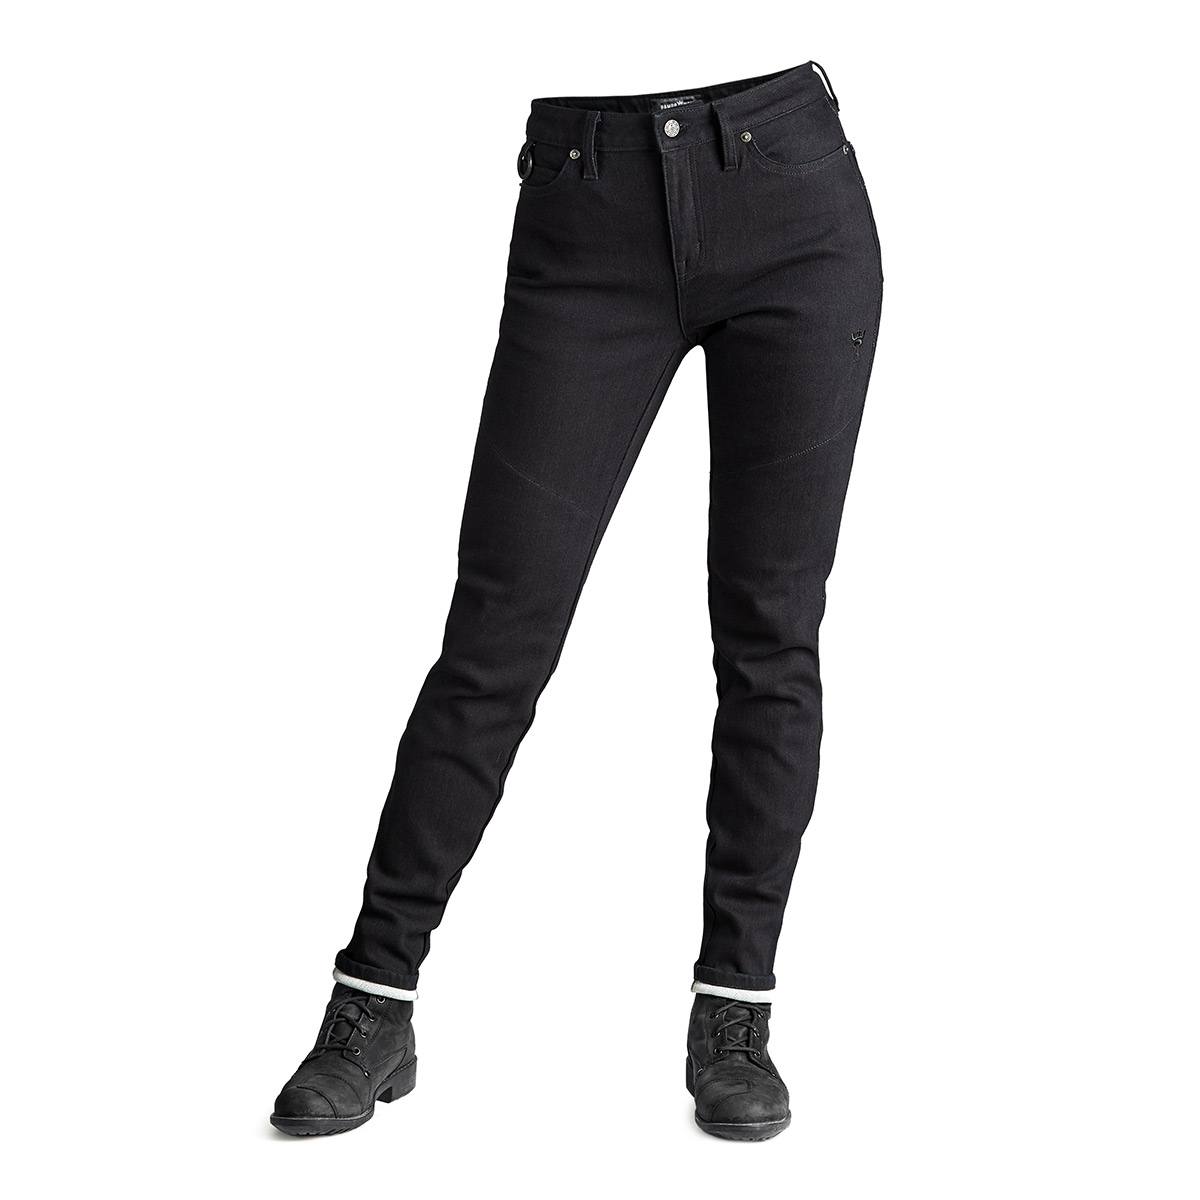 Pando Moto Kissaki Black Womens Jeans